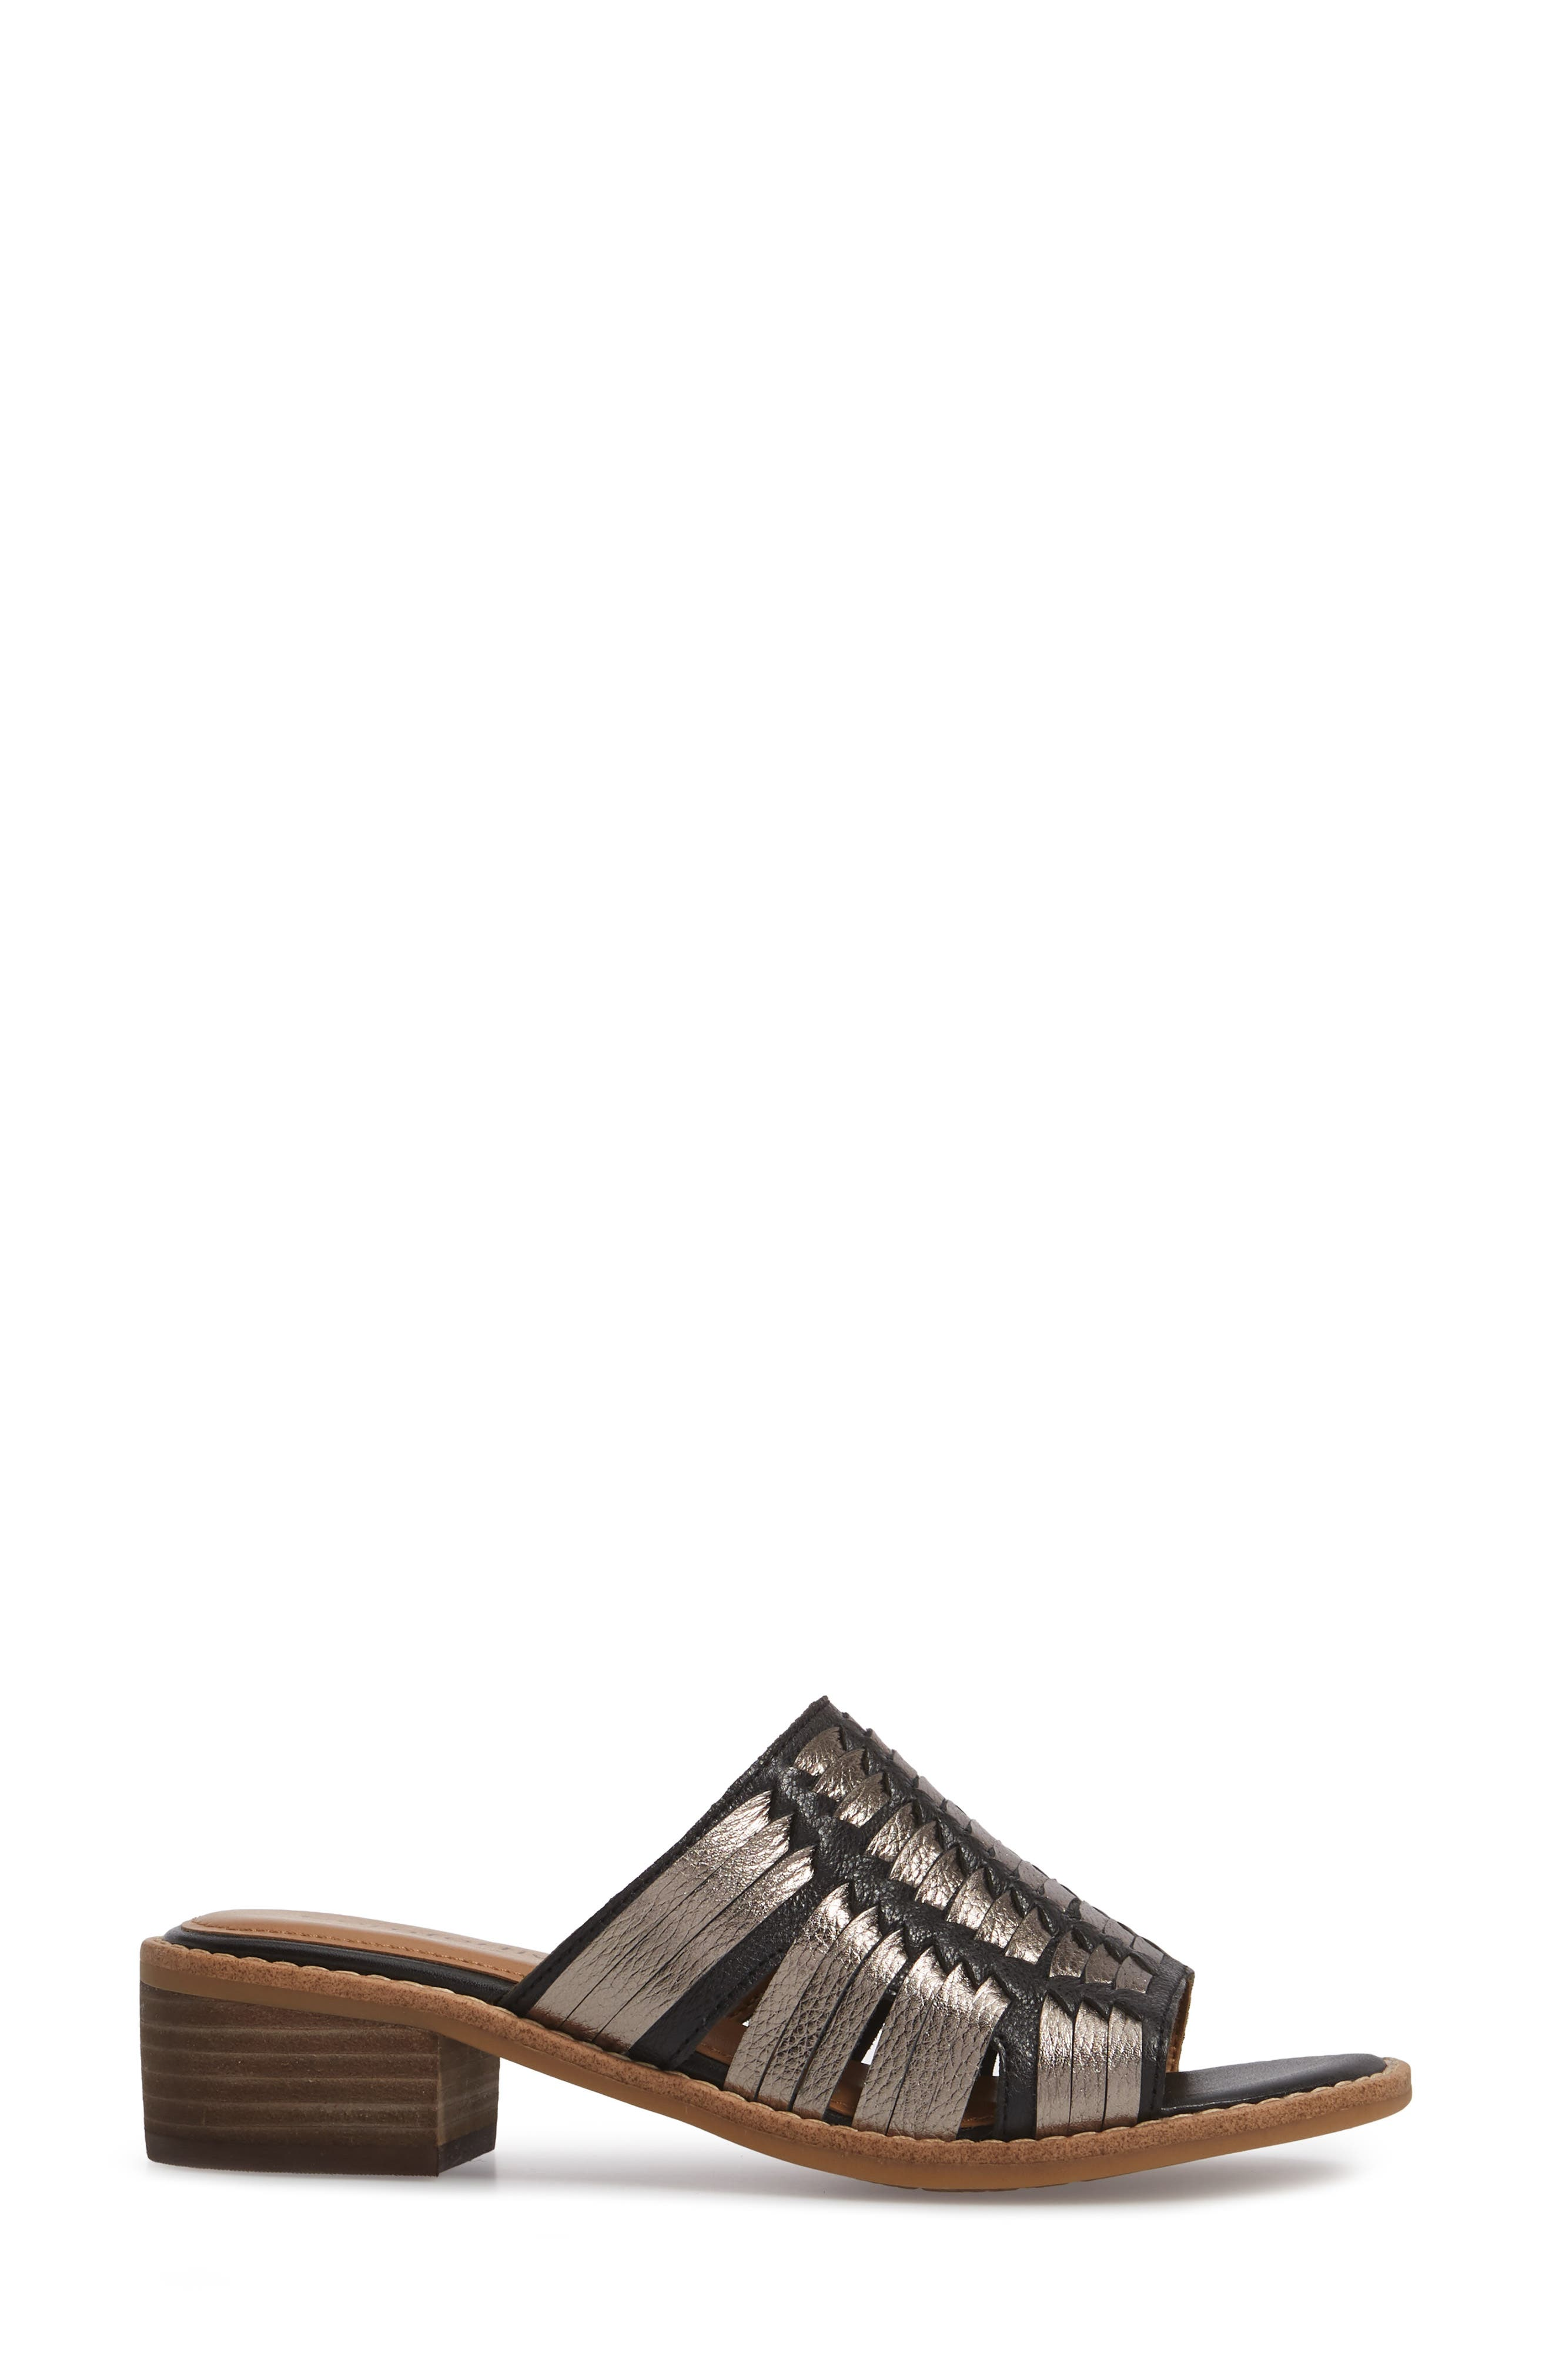 Brileigh Slide Sandal,                             Alternate thumbnail 3, color,                             Black Leather